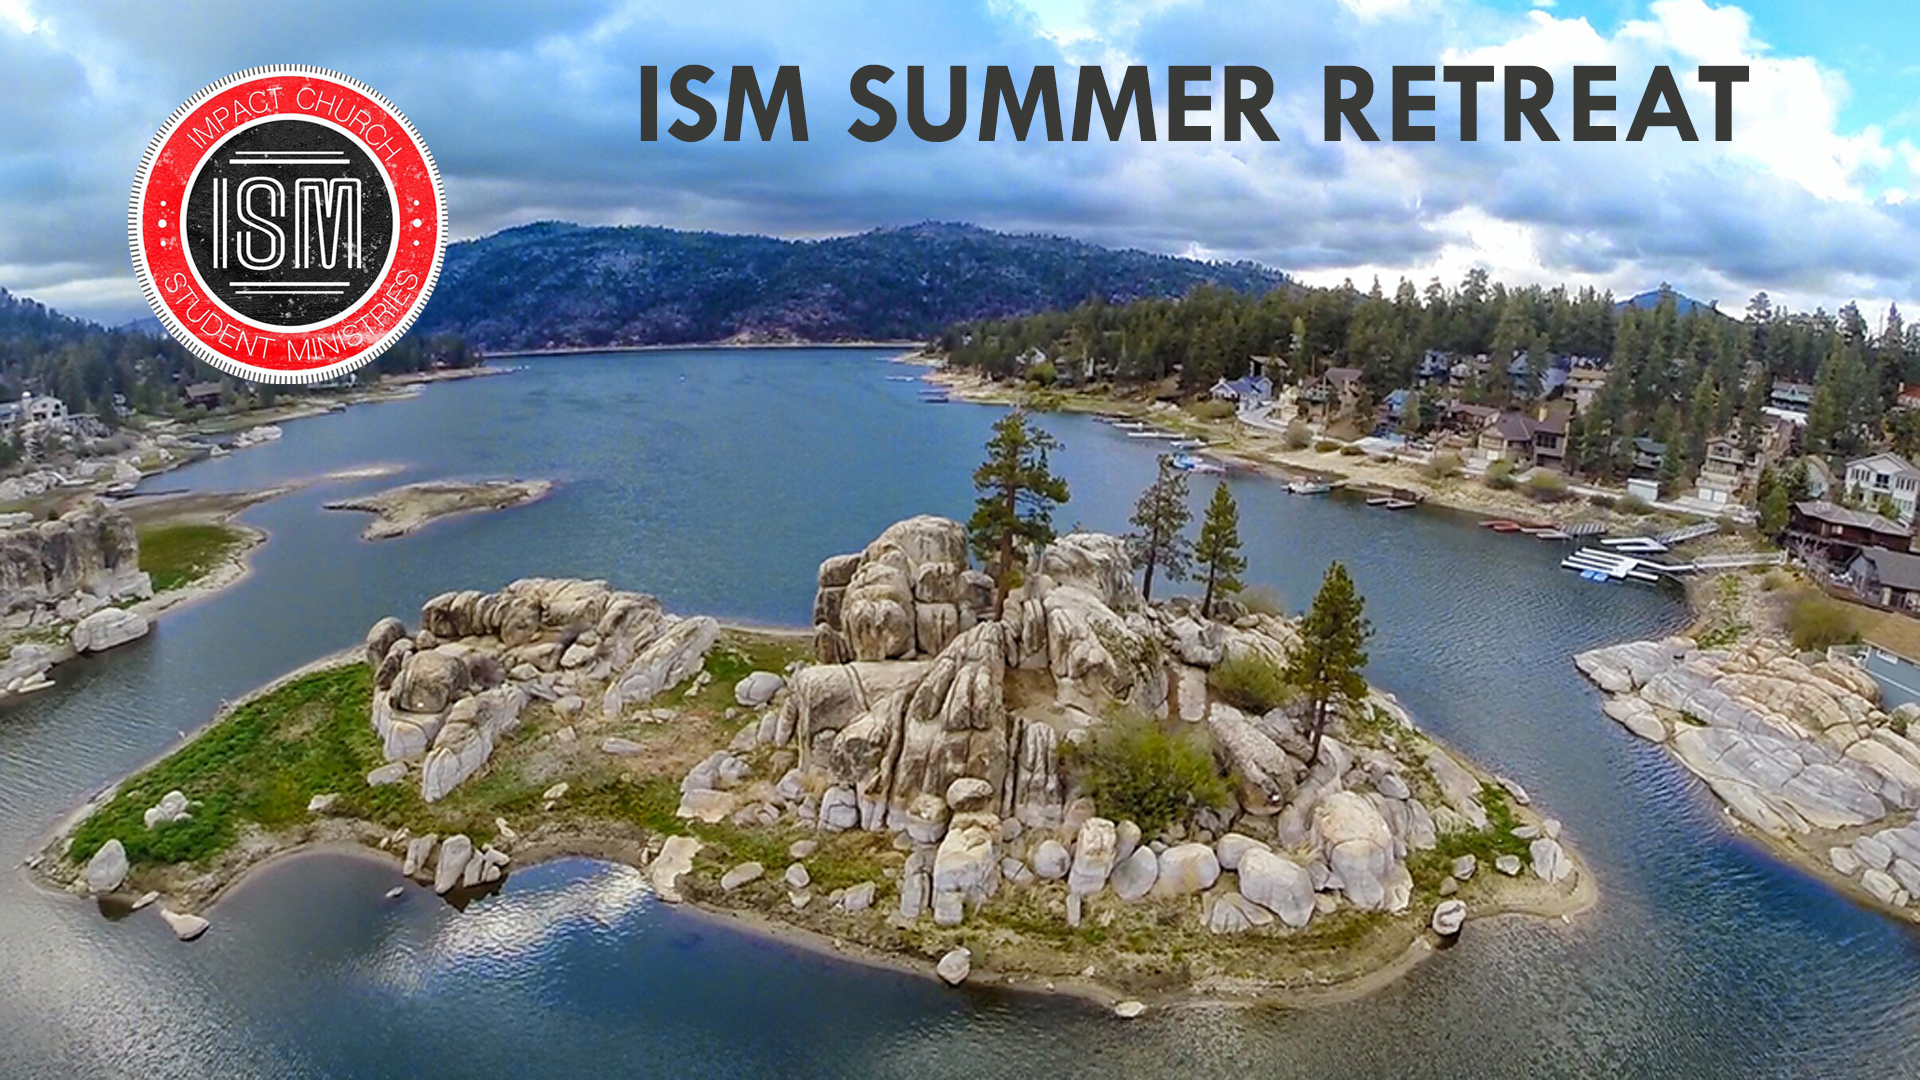 ISM Summer Retreat.jpg